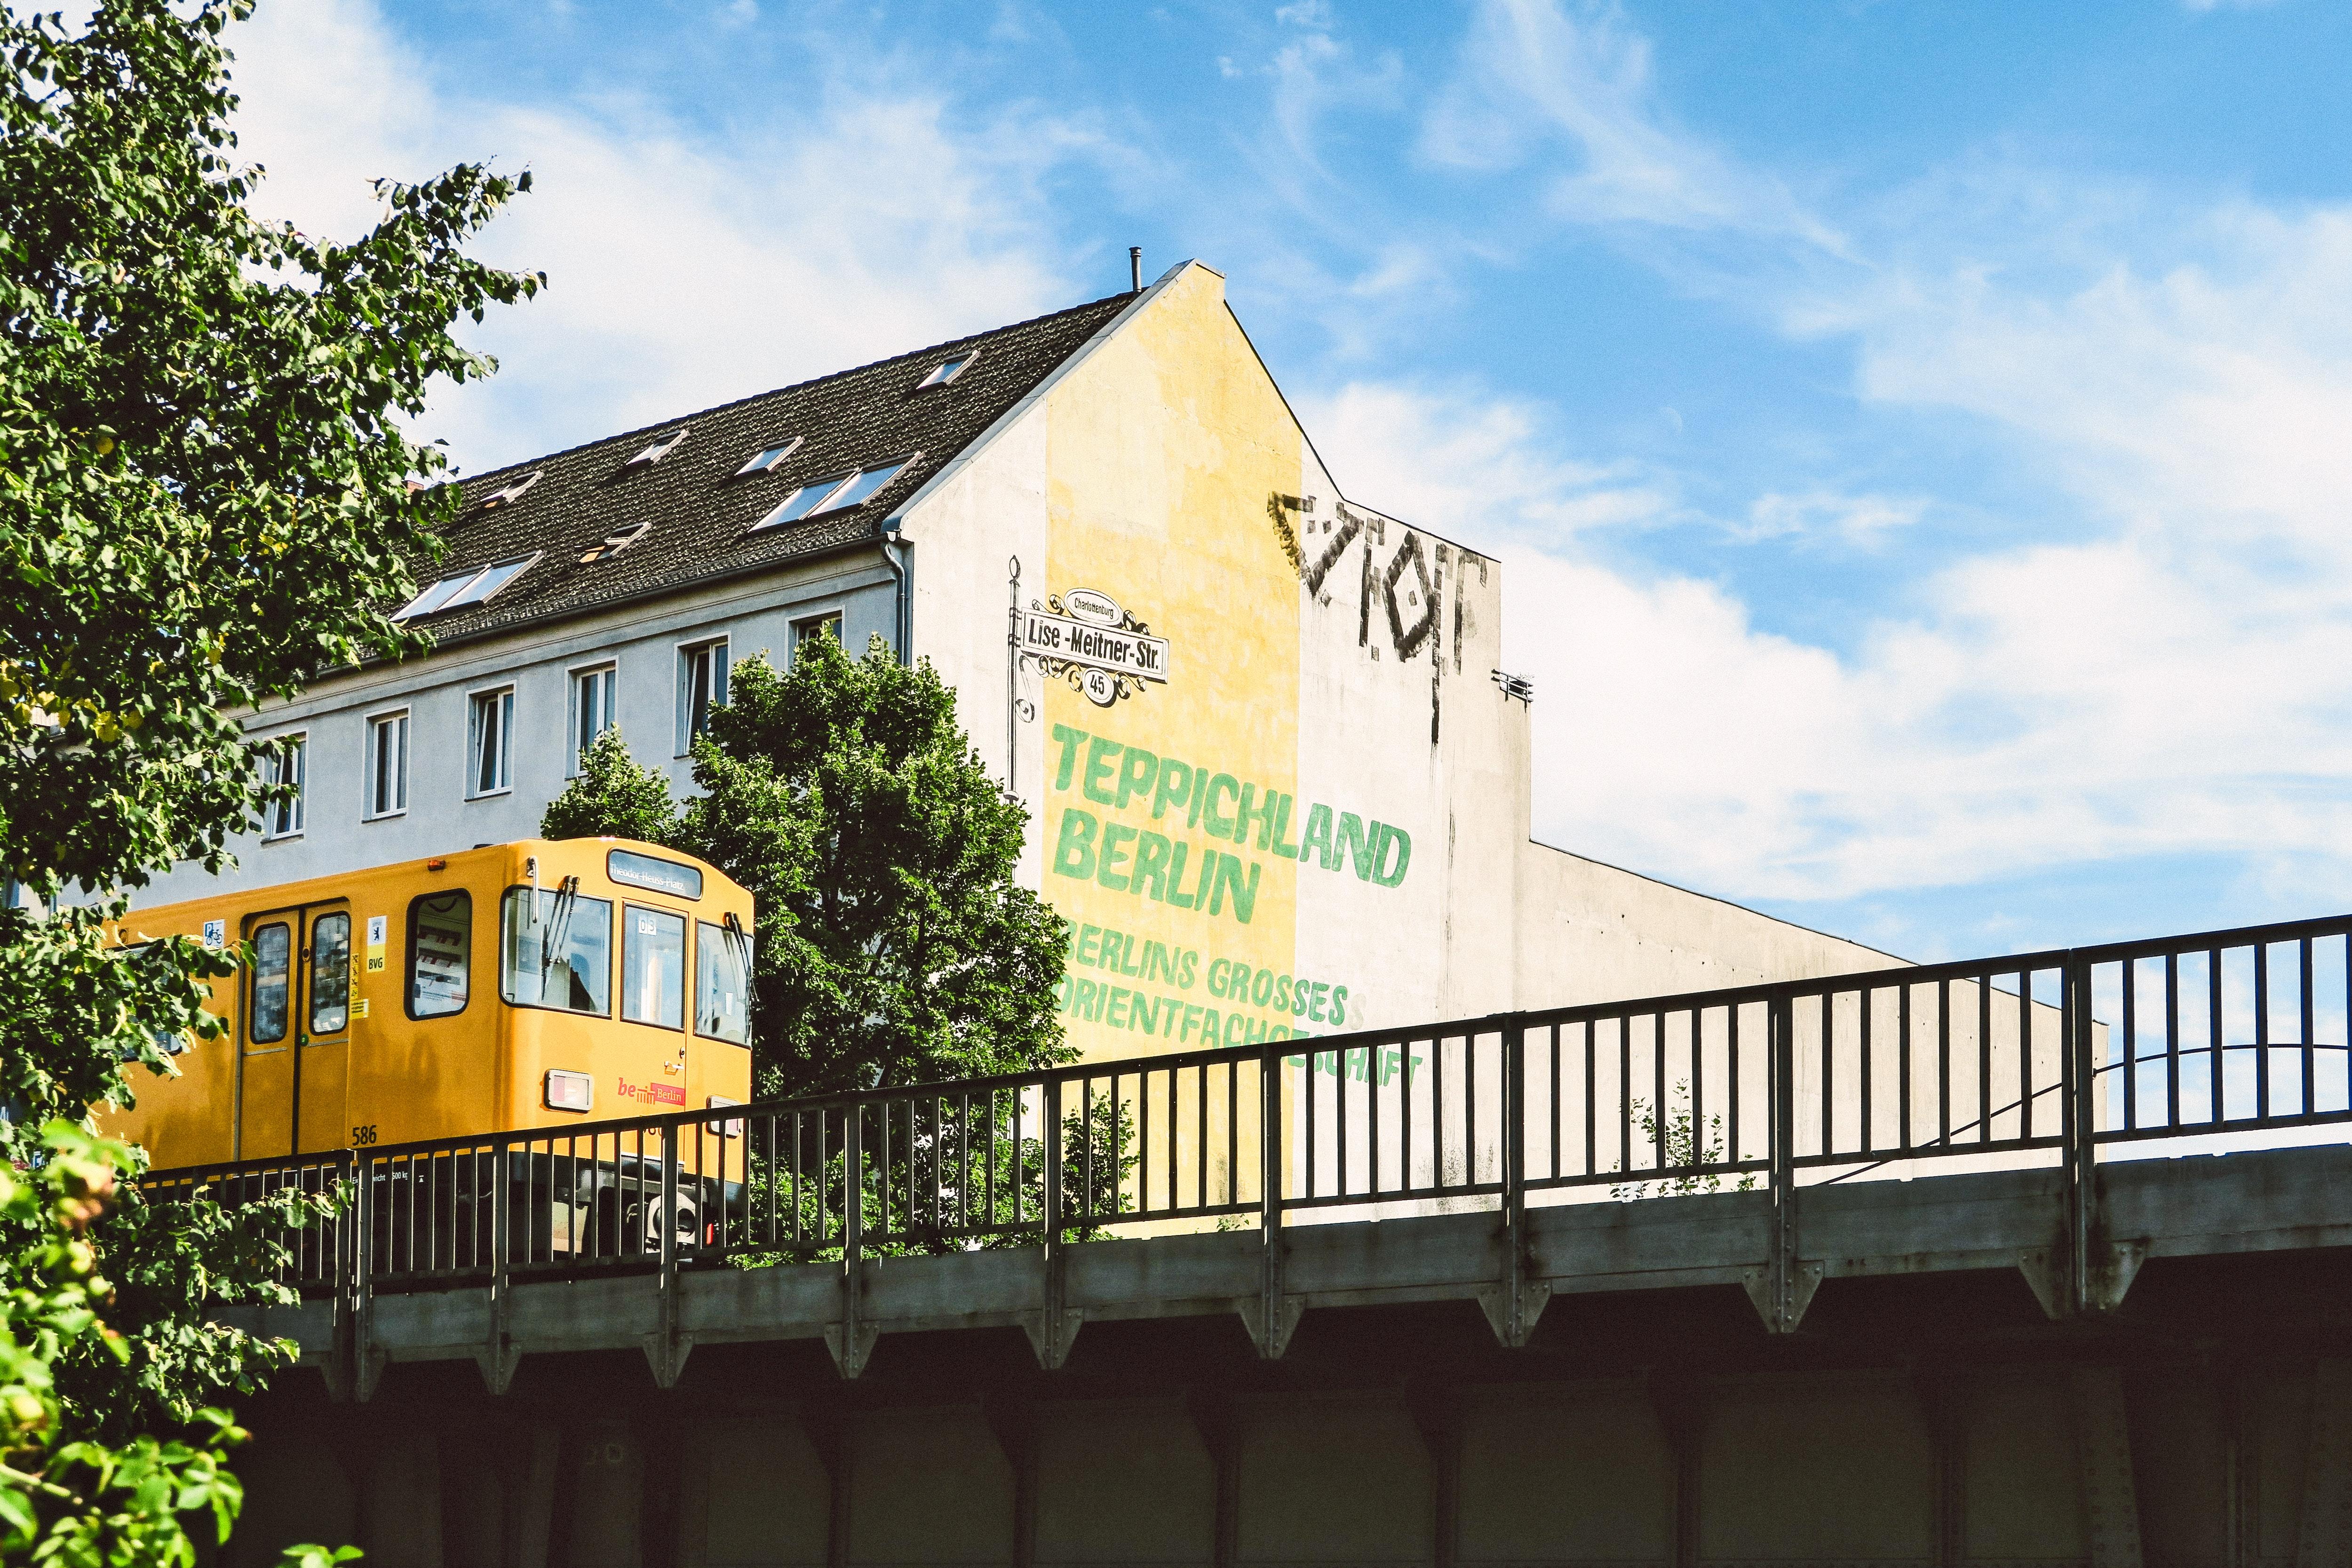 Yellow Train Beside Teppichland Berun Building Free Stock Photo